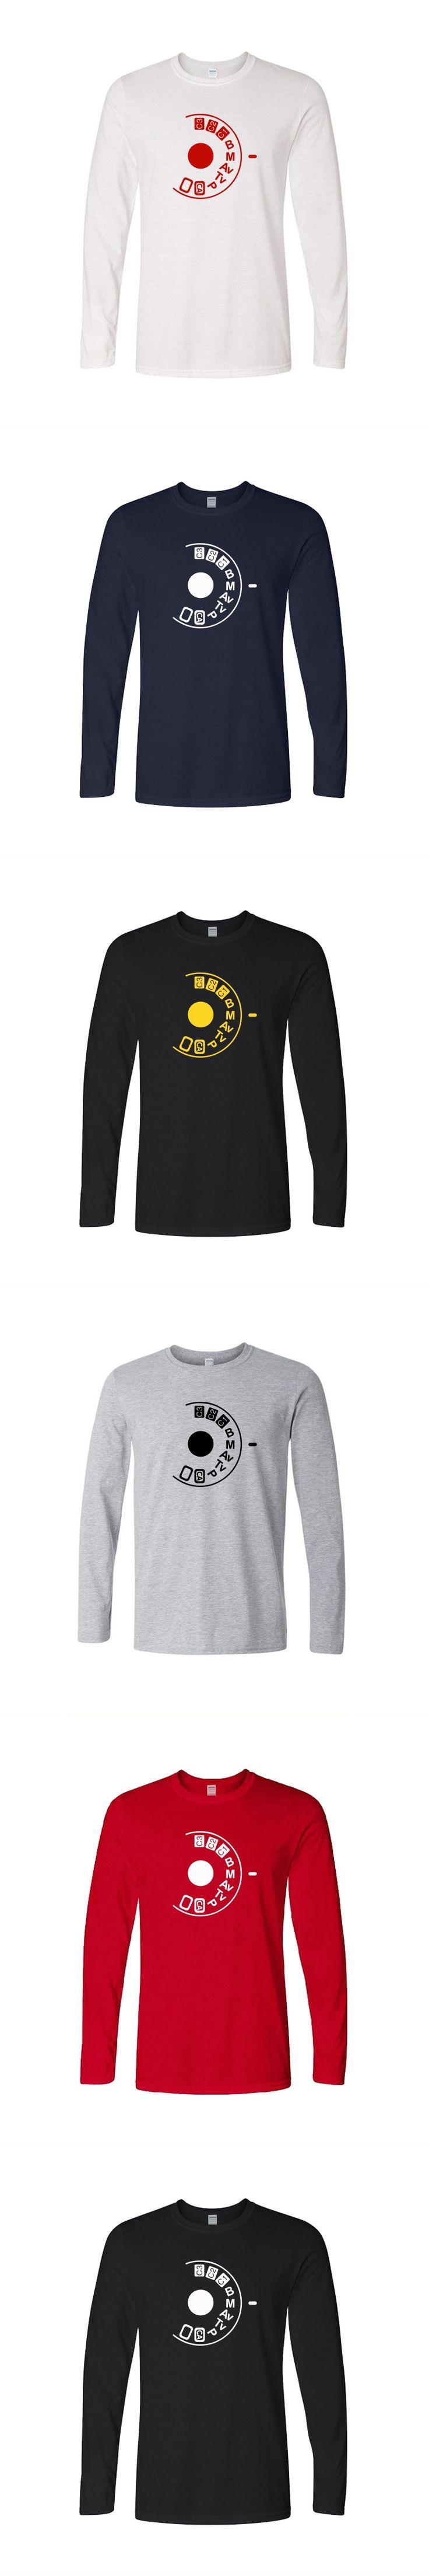 New Funny Shoot Manual Camera Buff Photography Lovers T-Shirts Mens O-Neck Cotton T Shirts Hip Hop Long Sleeve Tops Tees